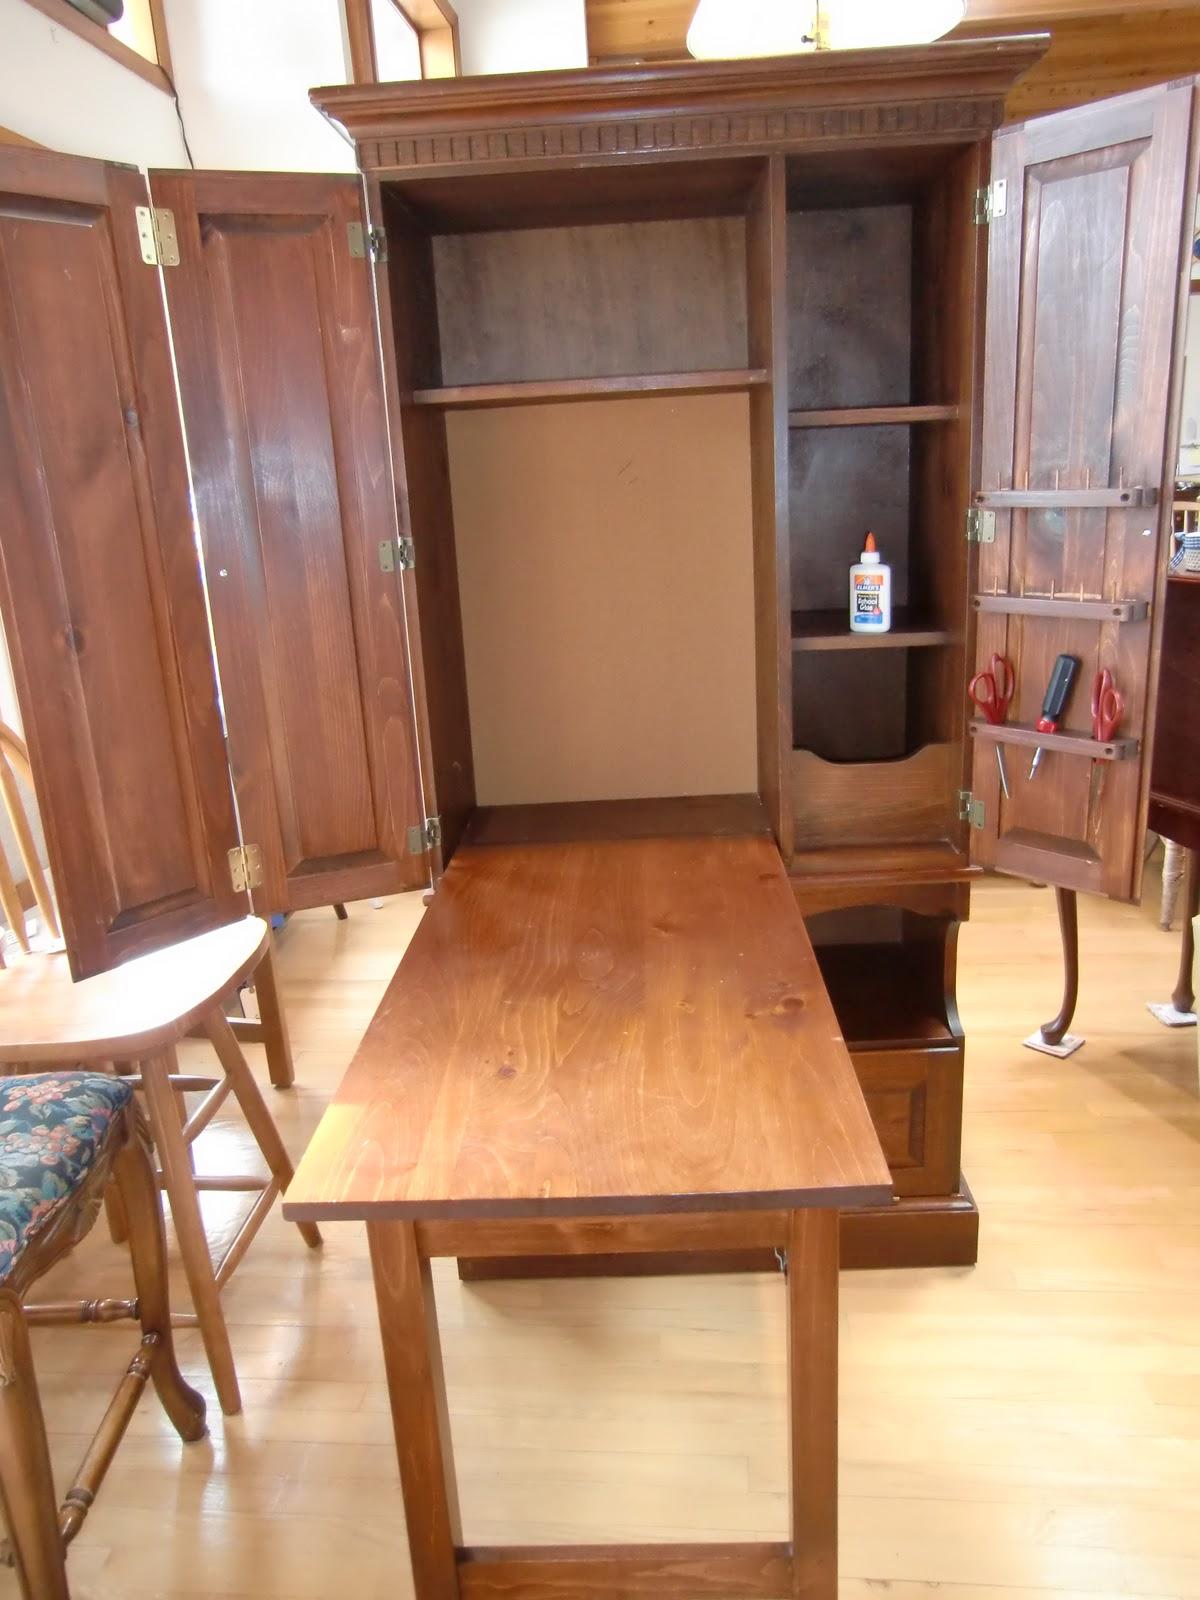 Upscale Furniture Resales